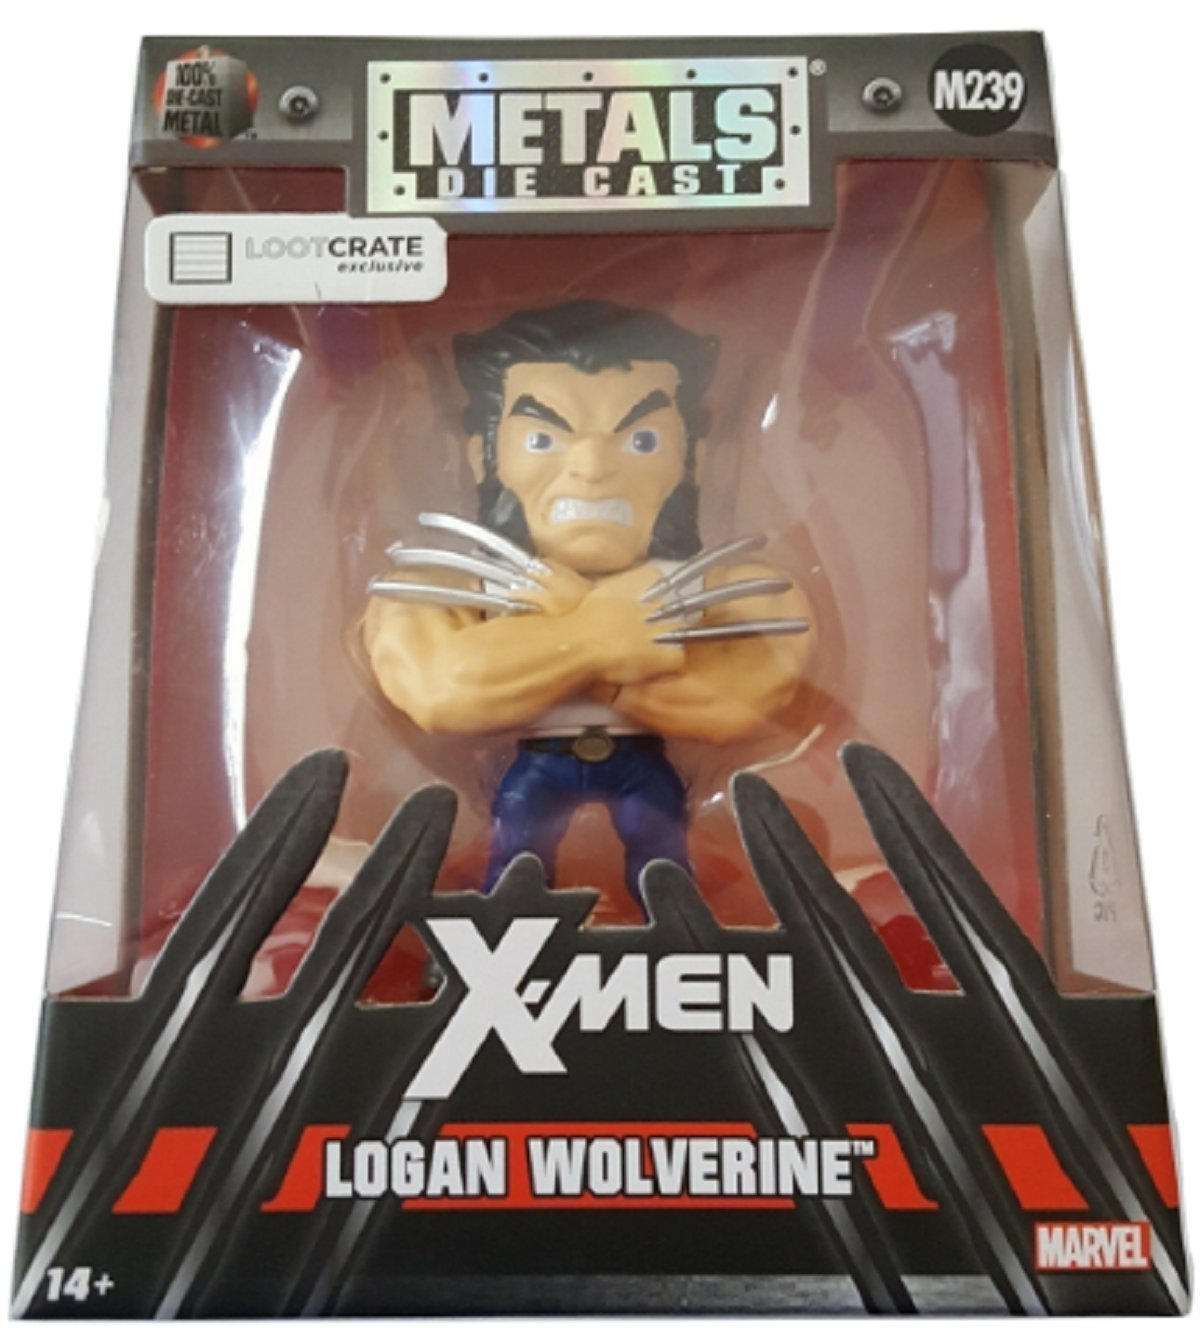 � Marvel Jada Die-Cast Metal Logan Wolverine M239 4.5 inches Figure - NEW �